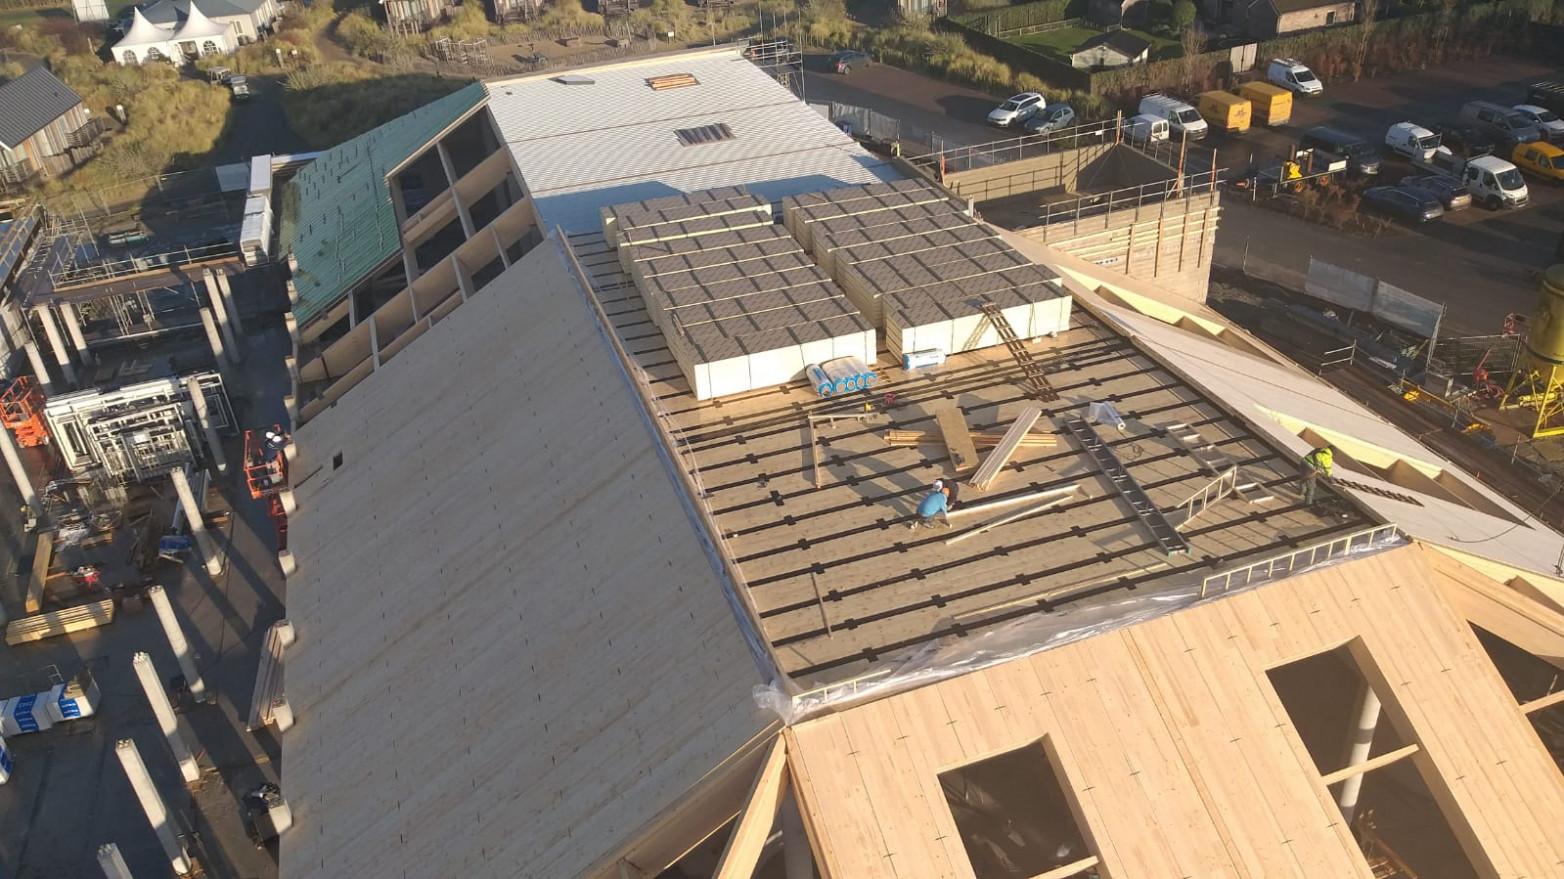 houtbouwer_draagconstructies_vakwerk_hoofdgebouw_e20c2d917b717f53fa22bd9f509fb25f (3)